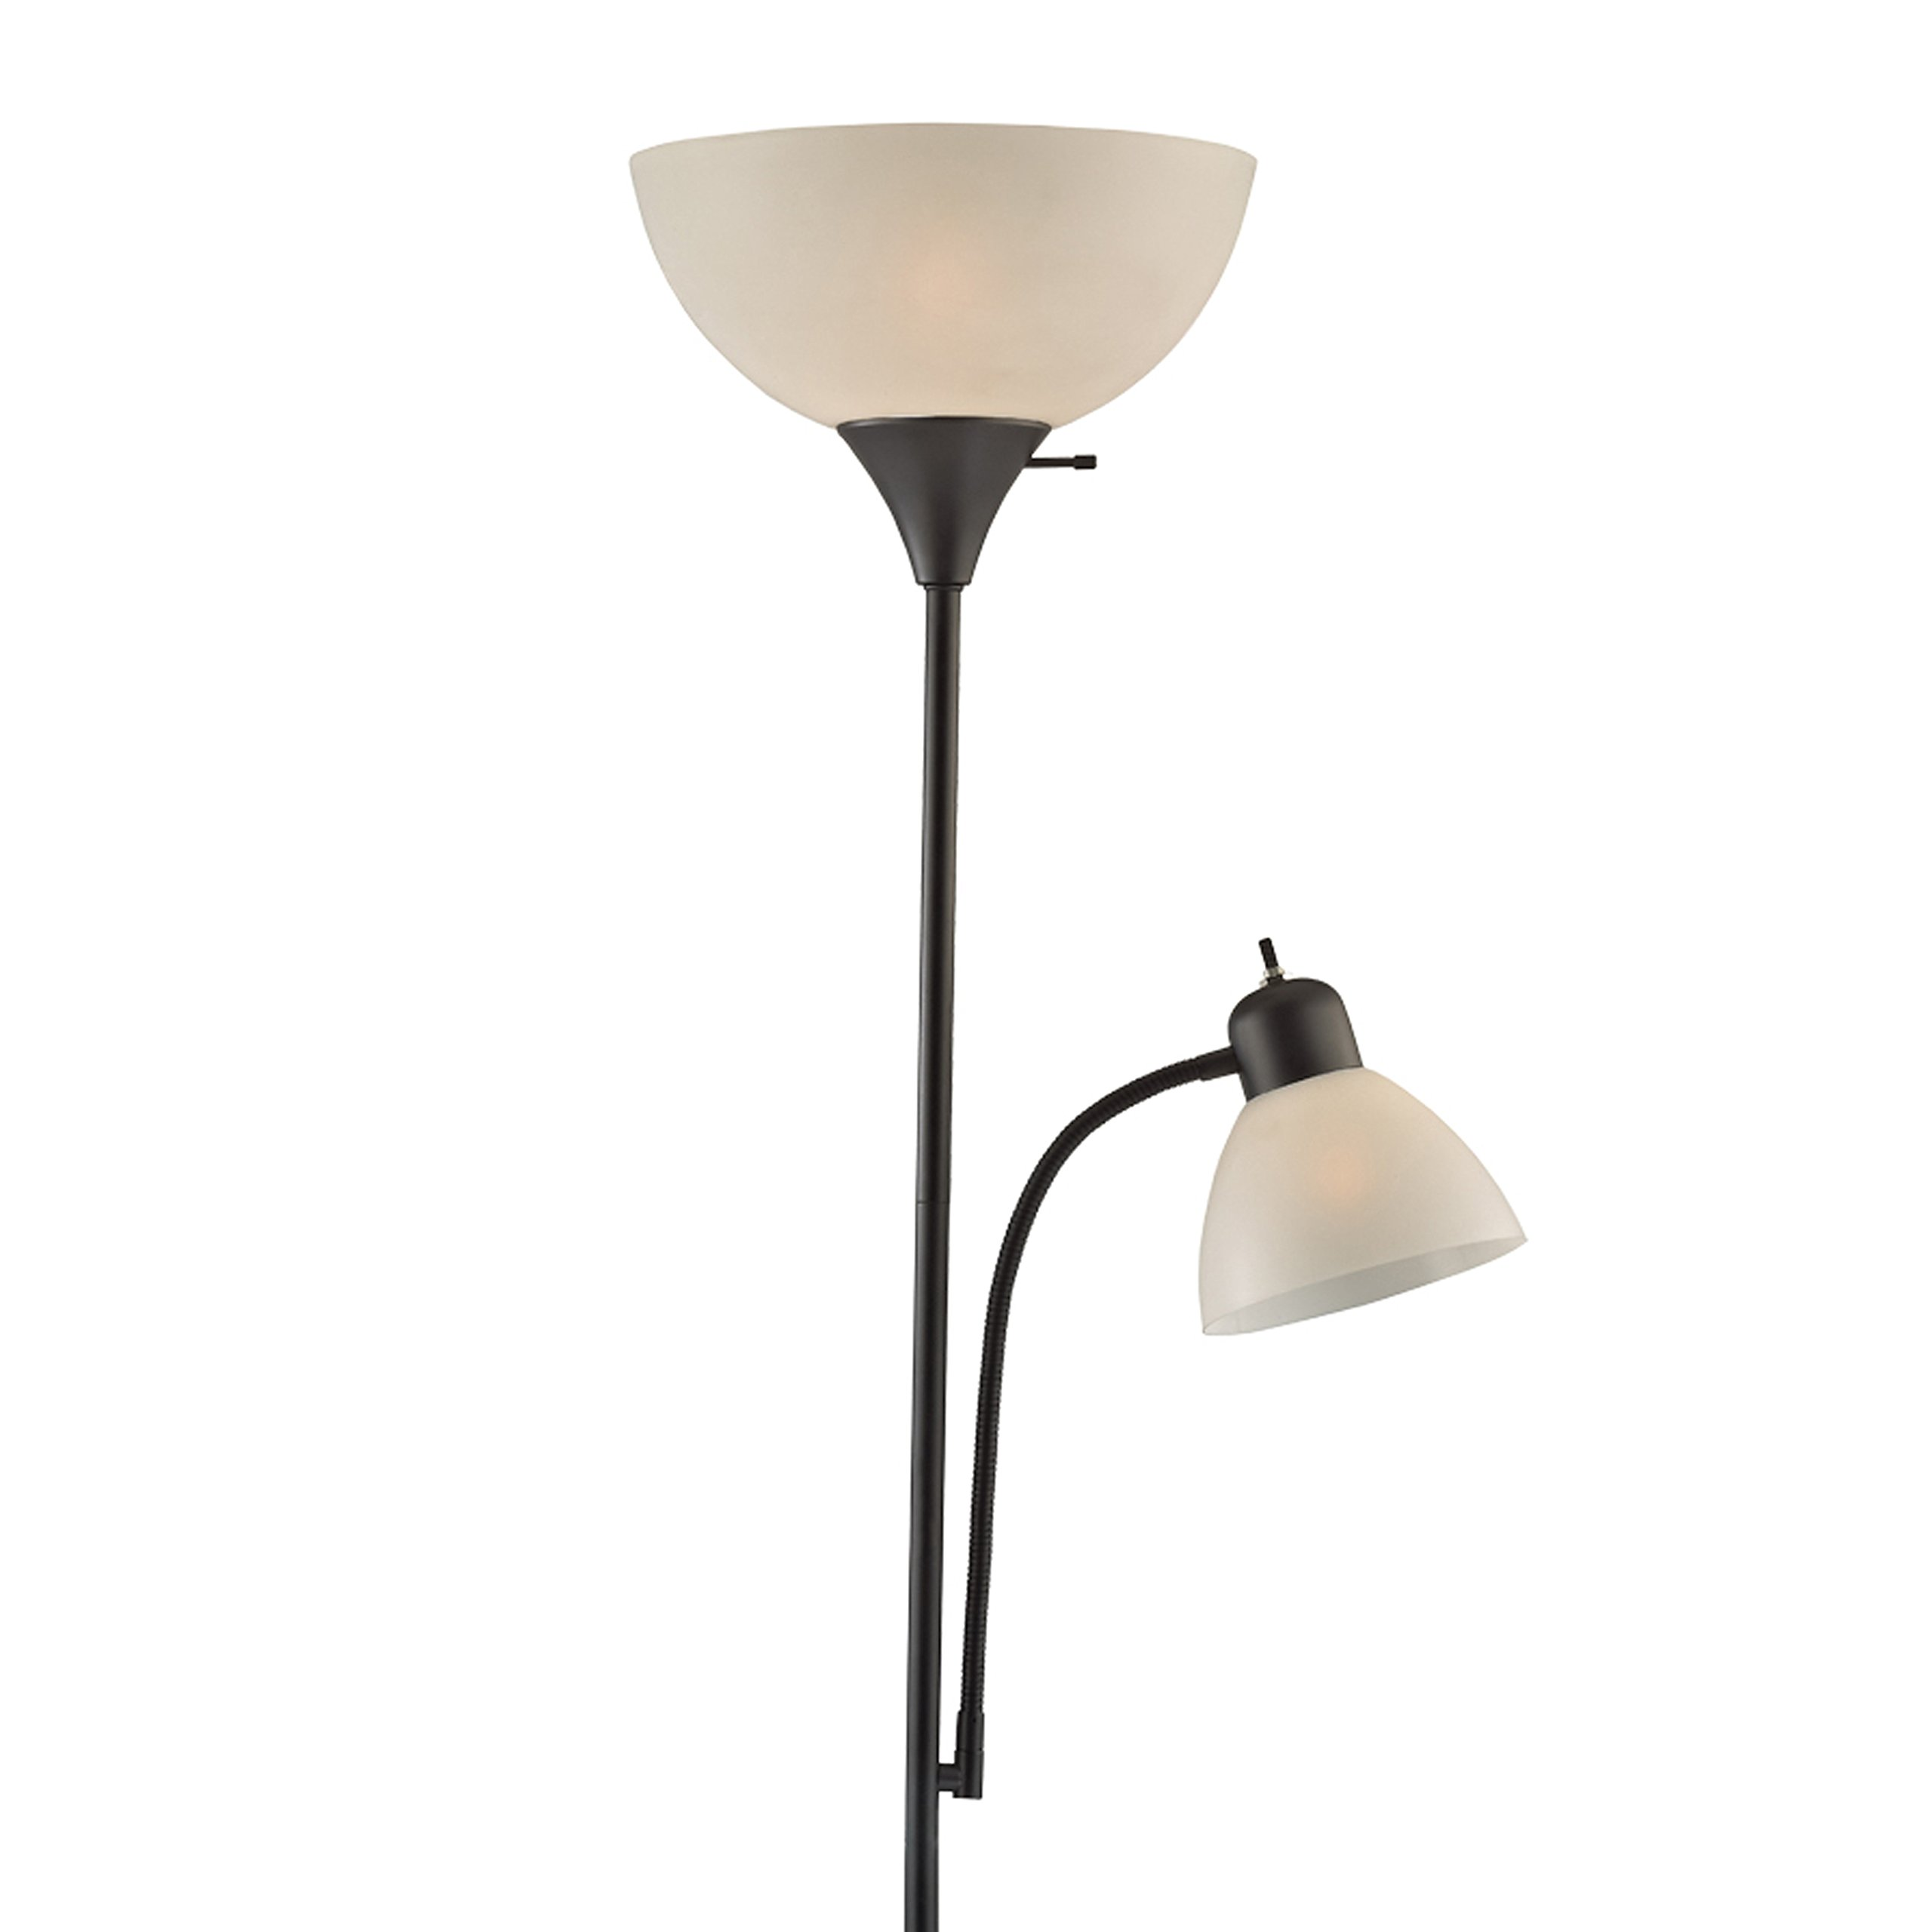 Light Accents SUSAN Floor Lamp 72'' Tall - 150-Watt with Side Reading Light (Black)